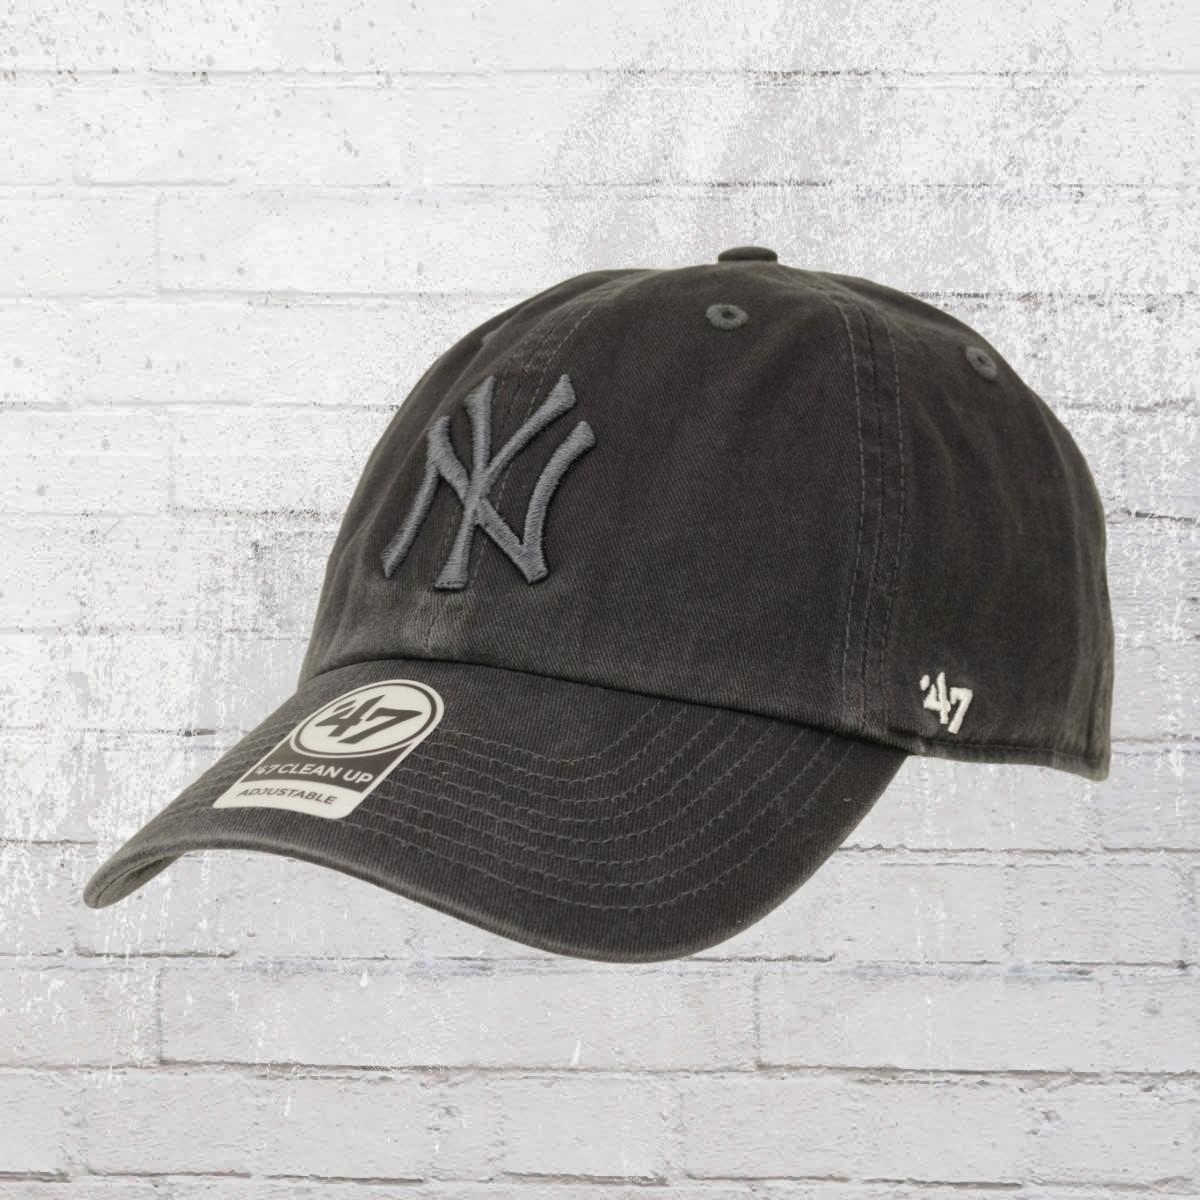 f3a60ec1bba28 47 Brands Team Cap New York Yankees Clean Up Hat dark charcoal. ›‹ «